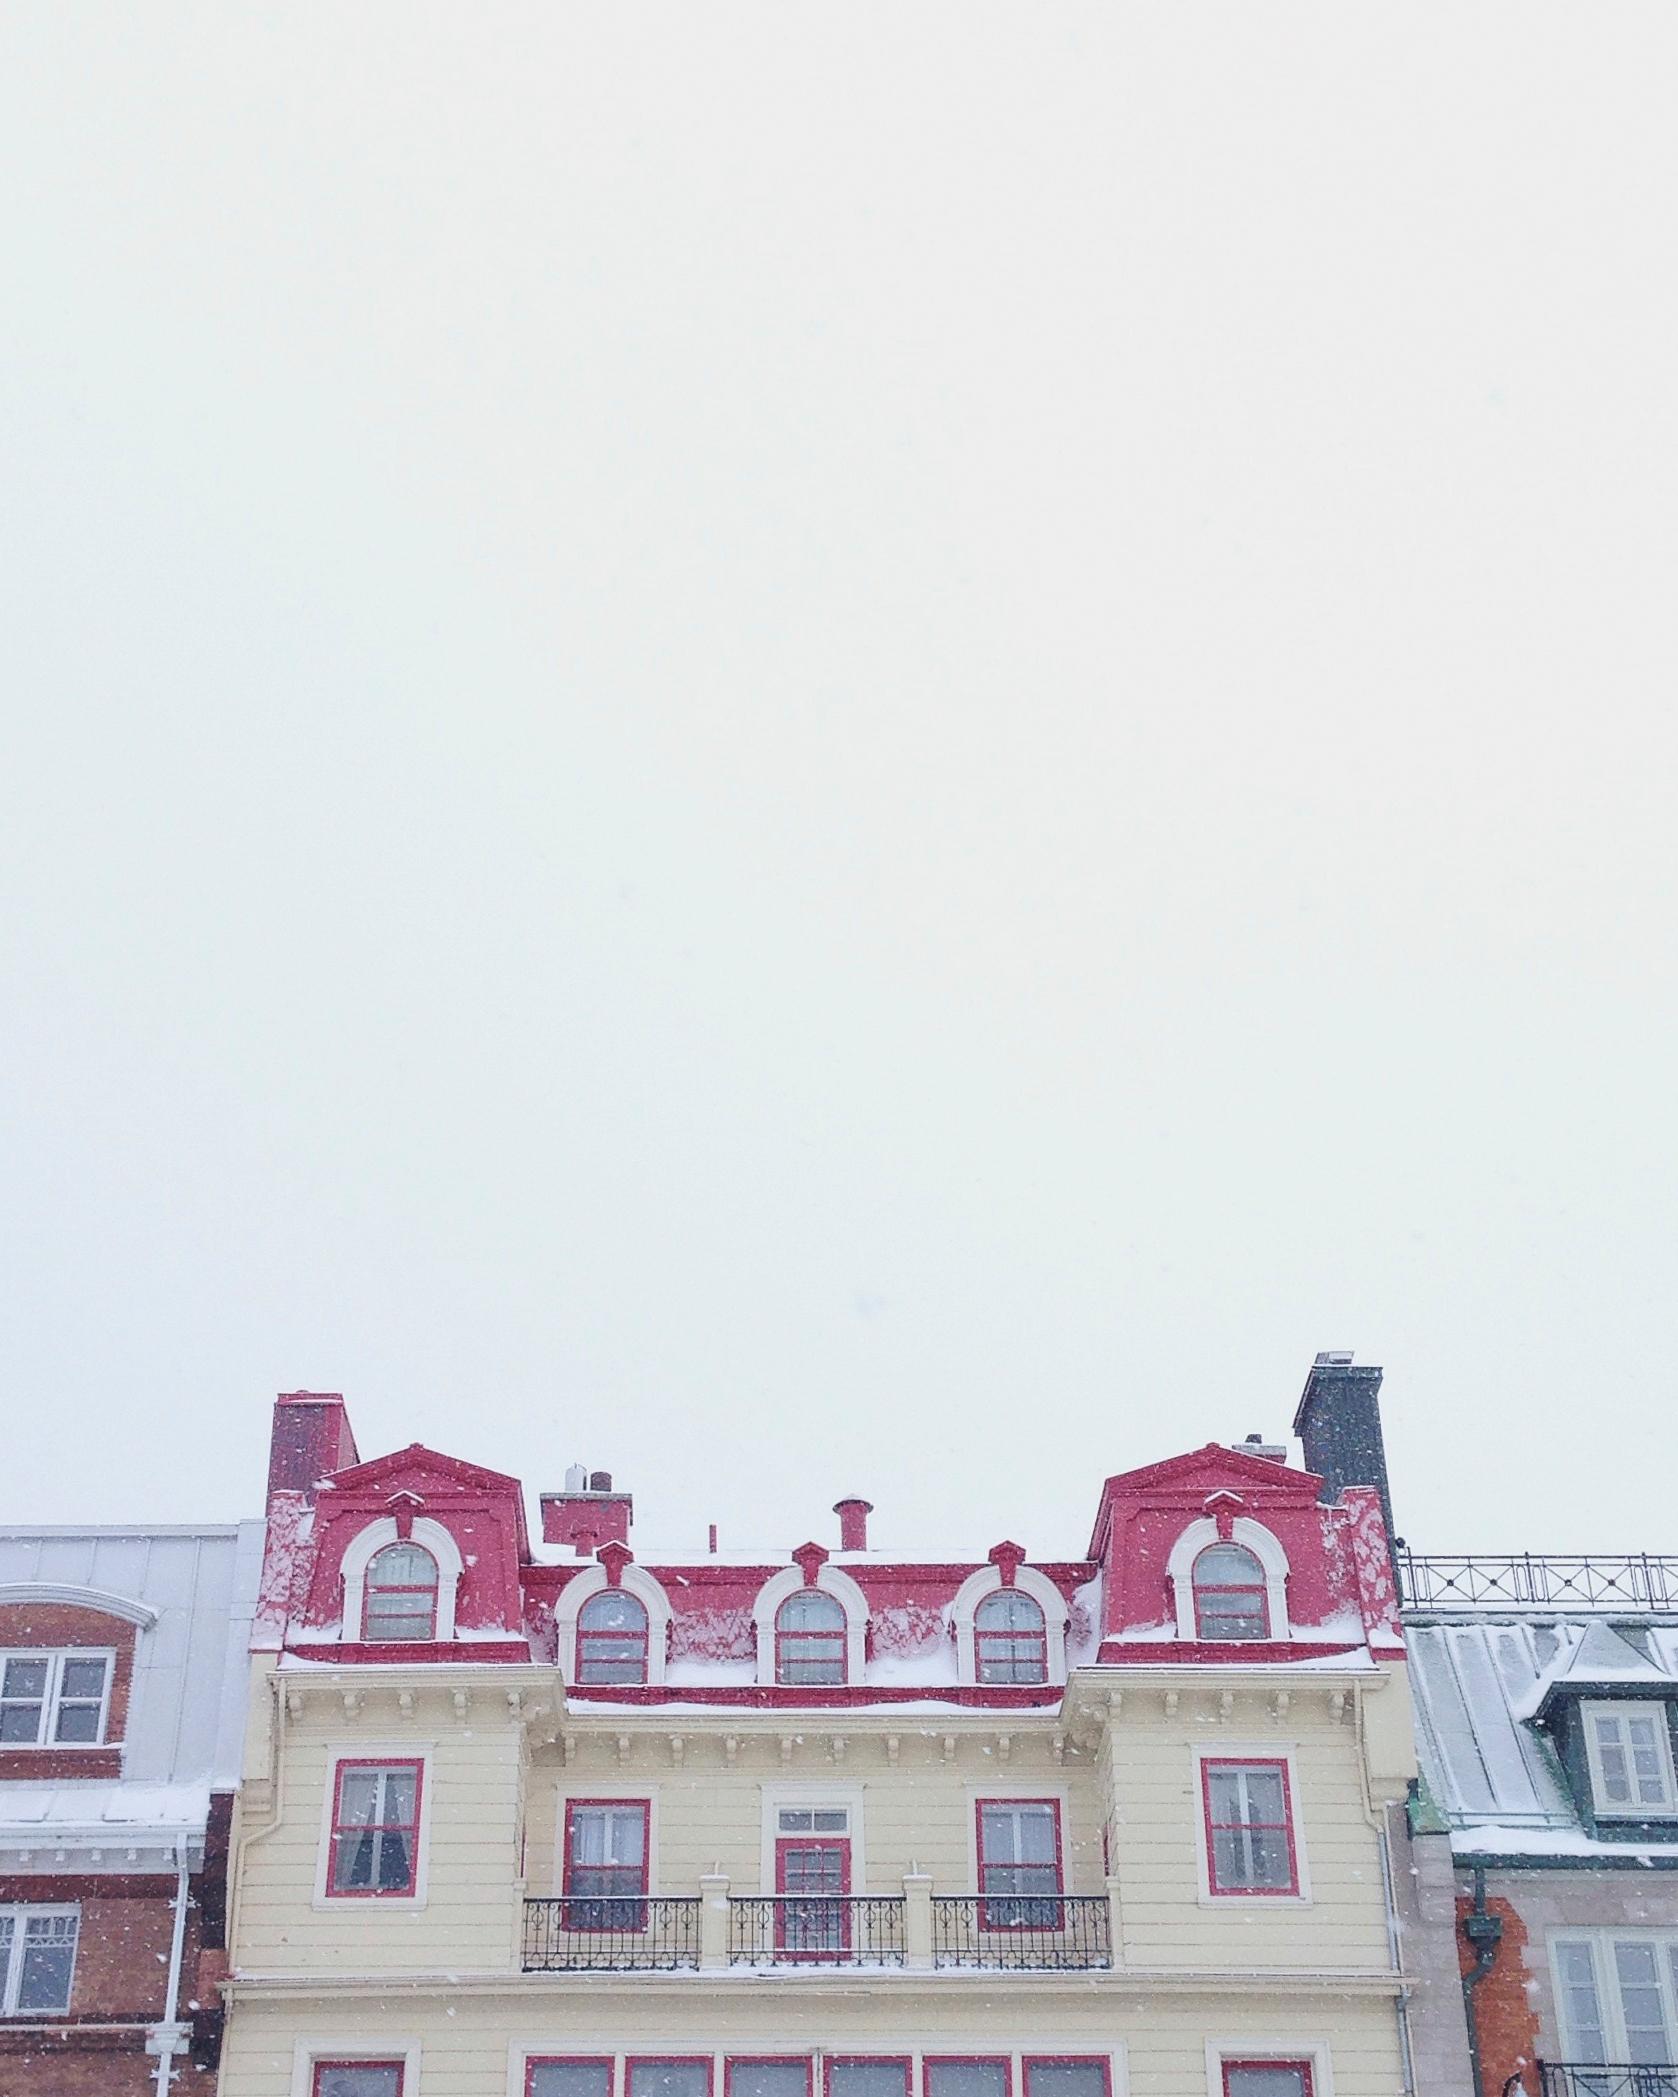 quebec-city-3117-honeymoon-diaries-s111679-0115.jpg